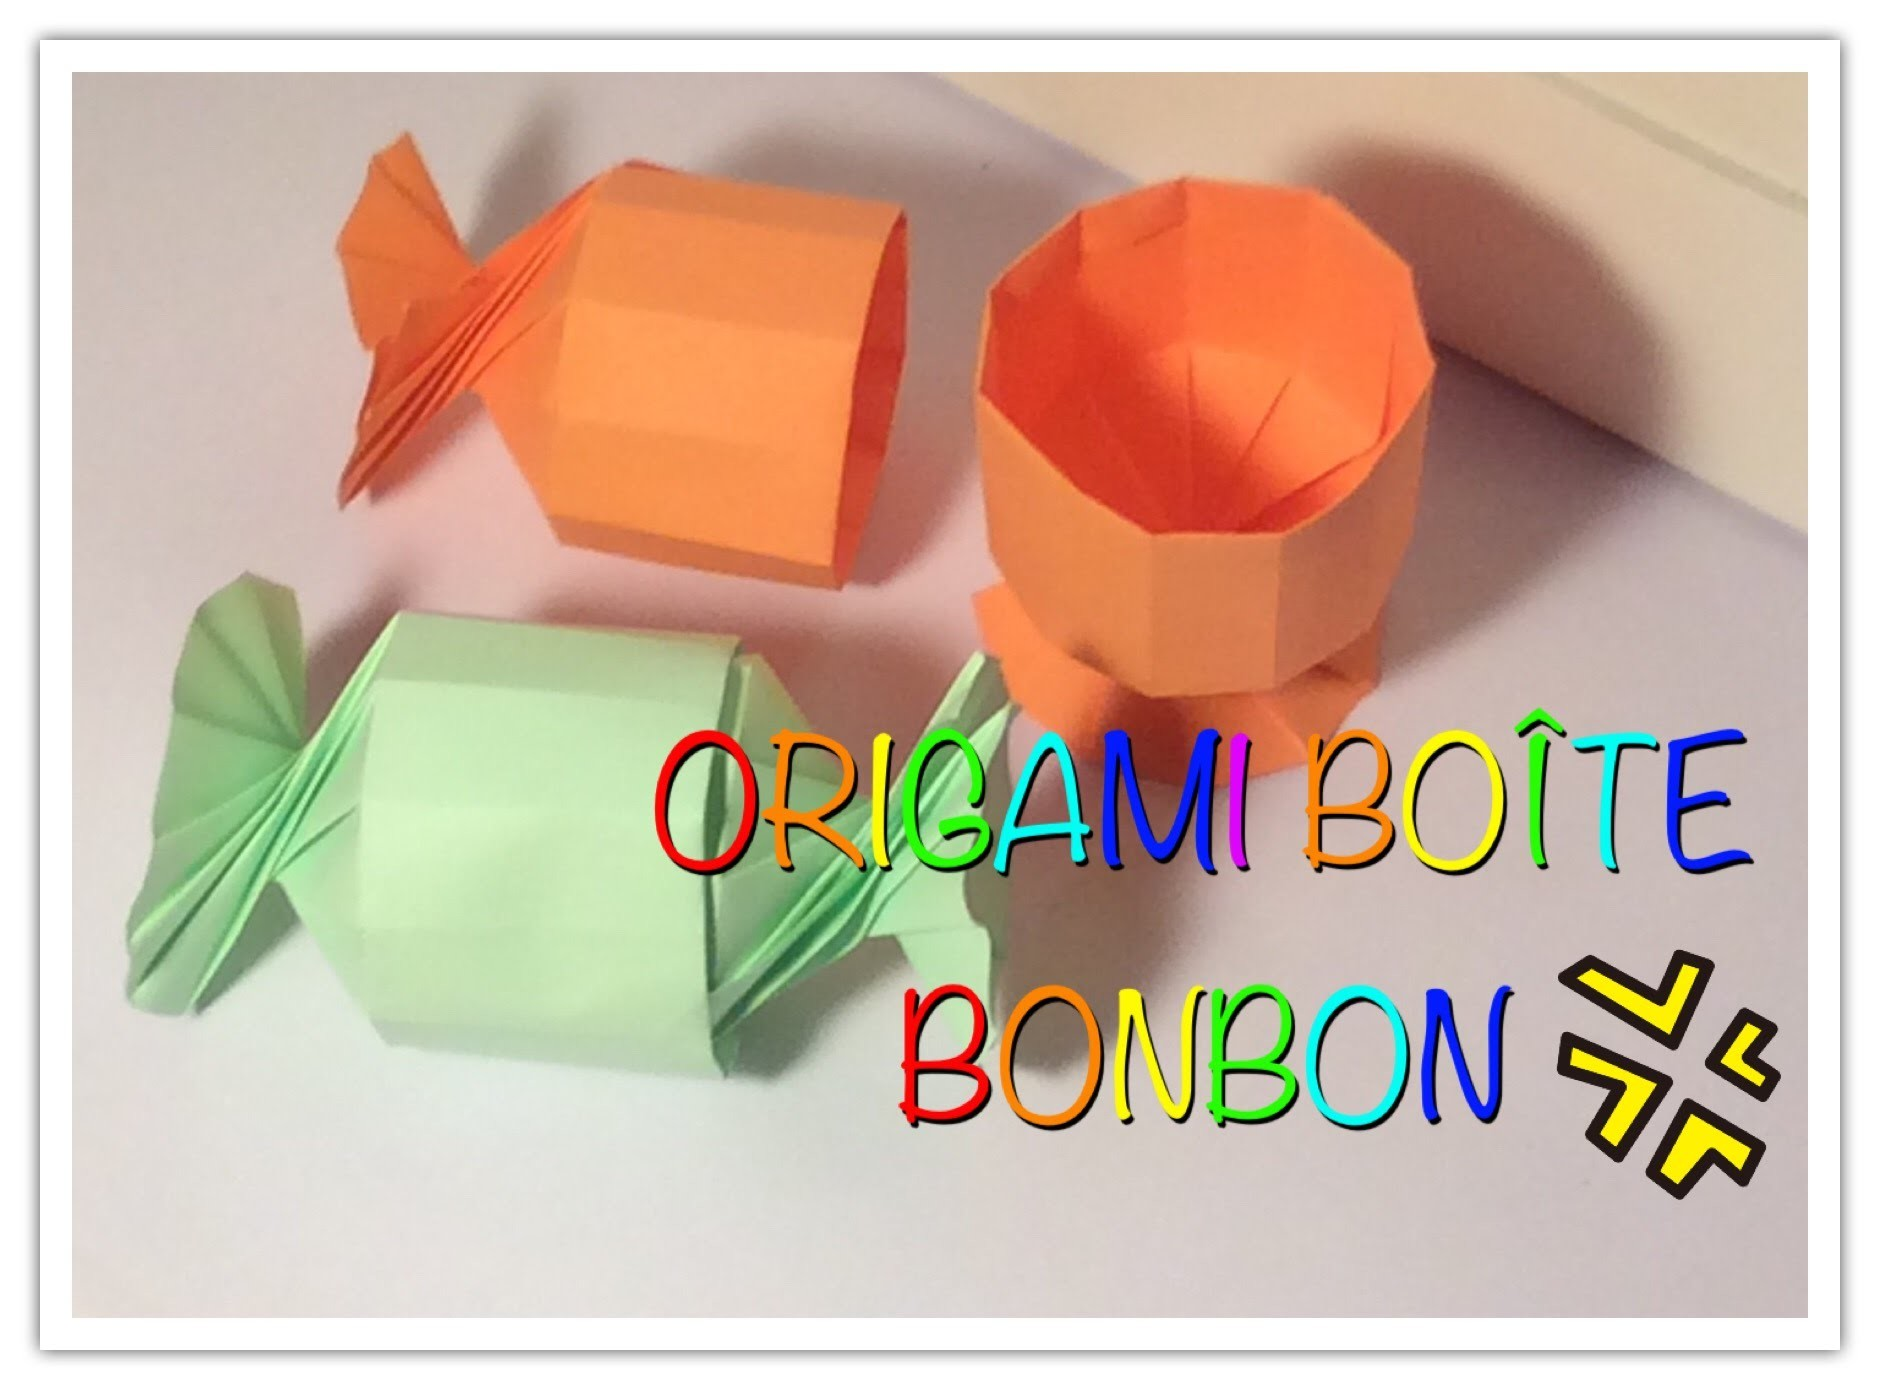 ORIGAMI BOÎTE BONBON. CANDY BOX (Mathis Lopez - Funny Origami) - photo#4